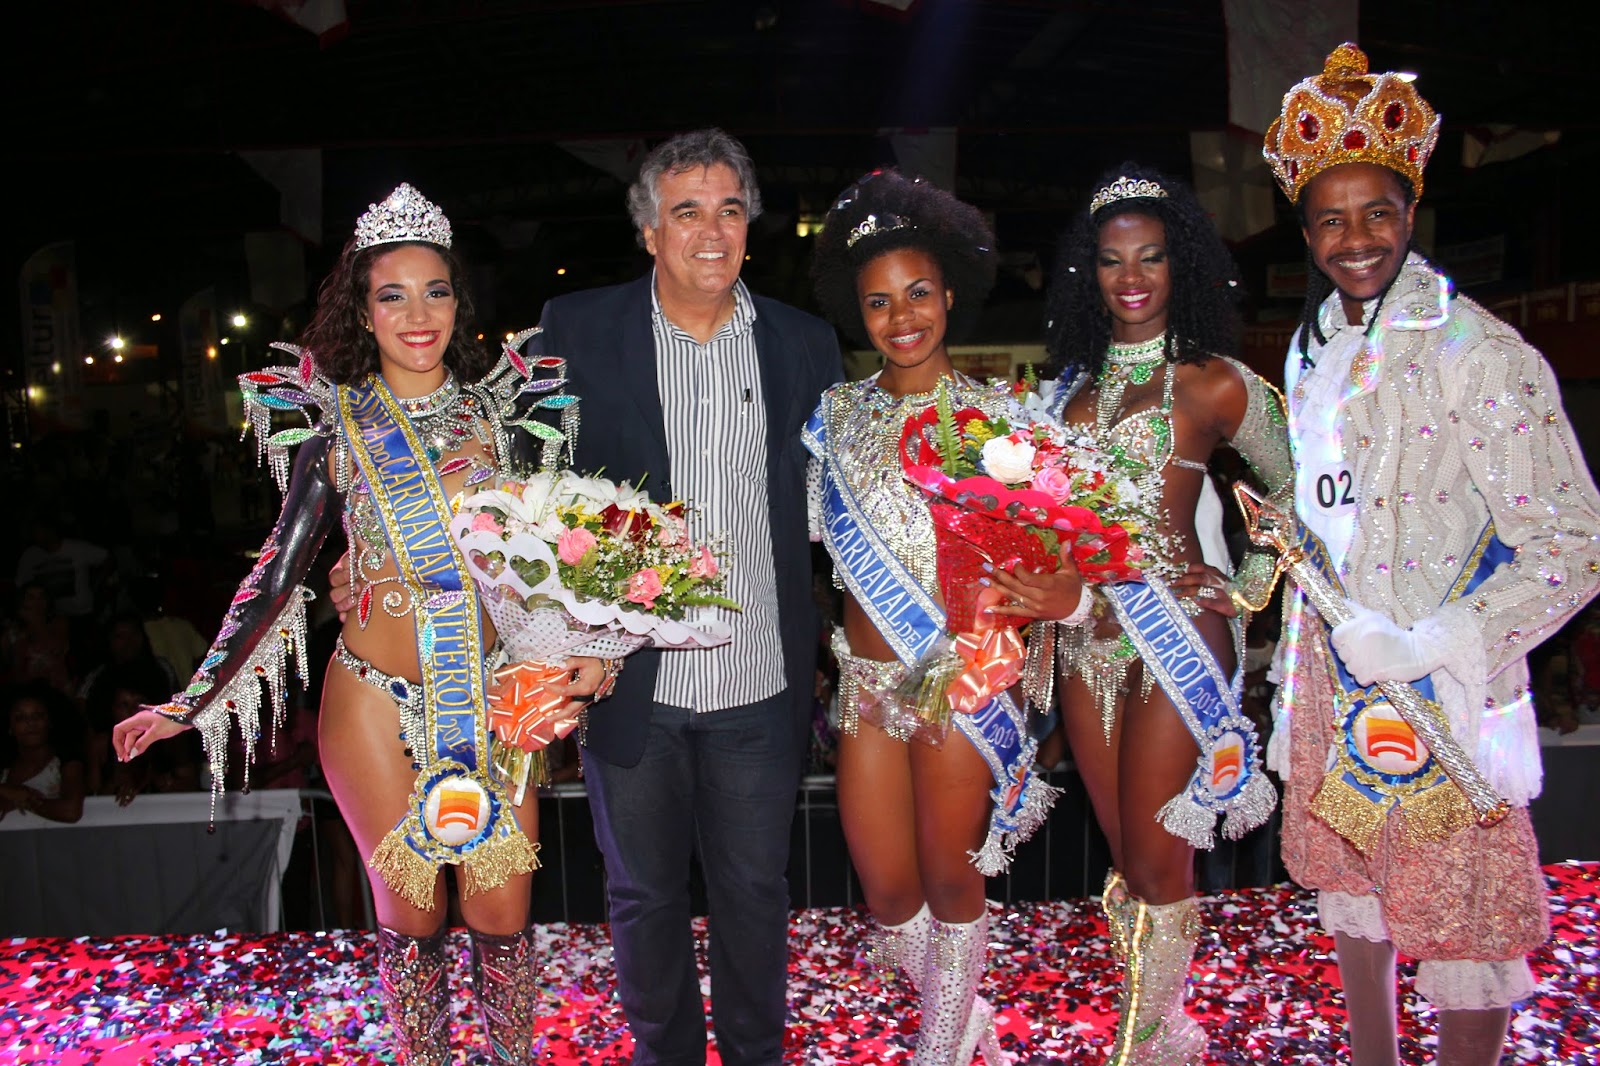 Niterói já tem sua corte momesca para o Carnaval 2015